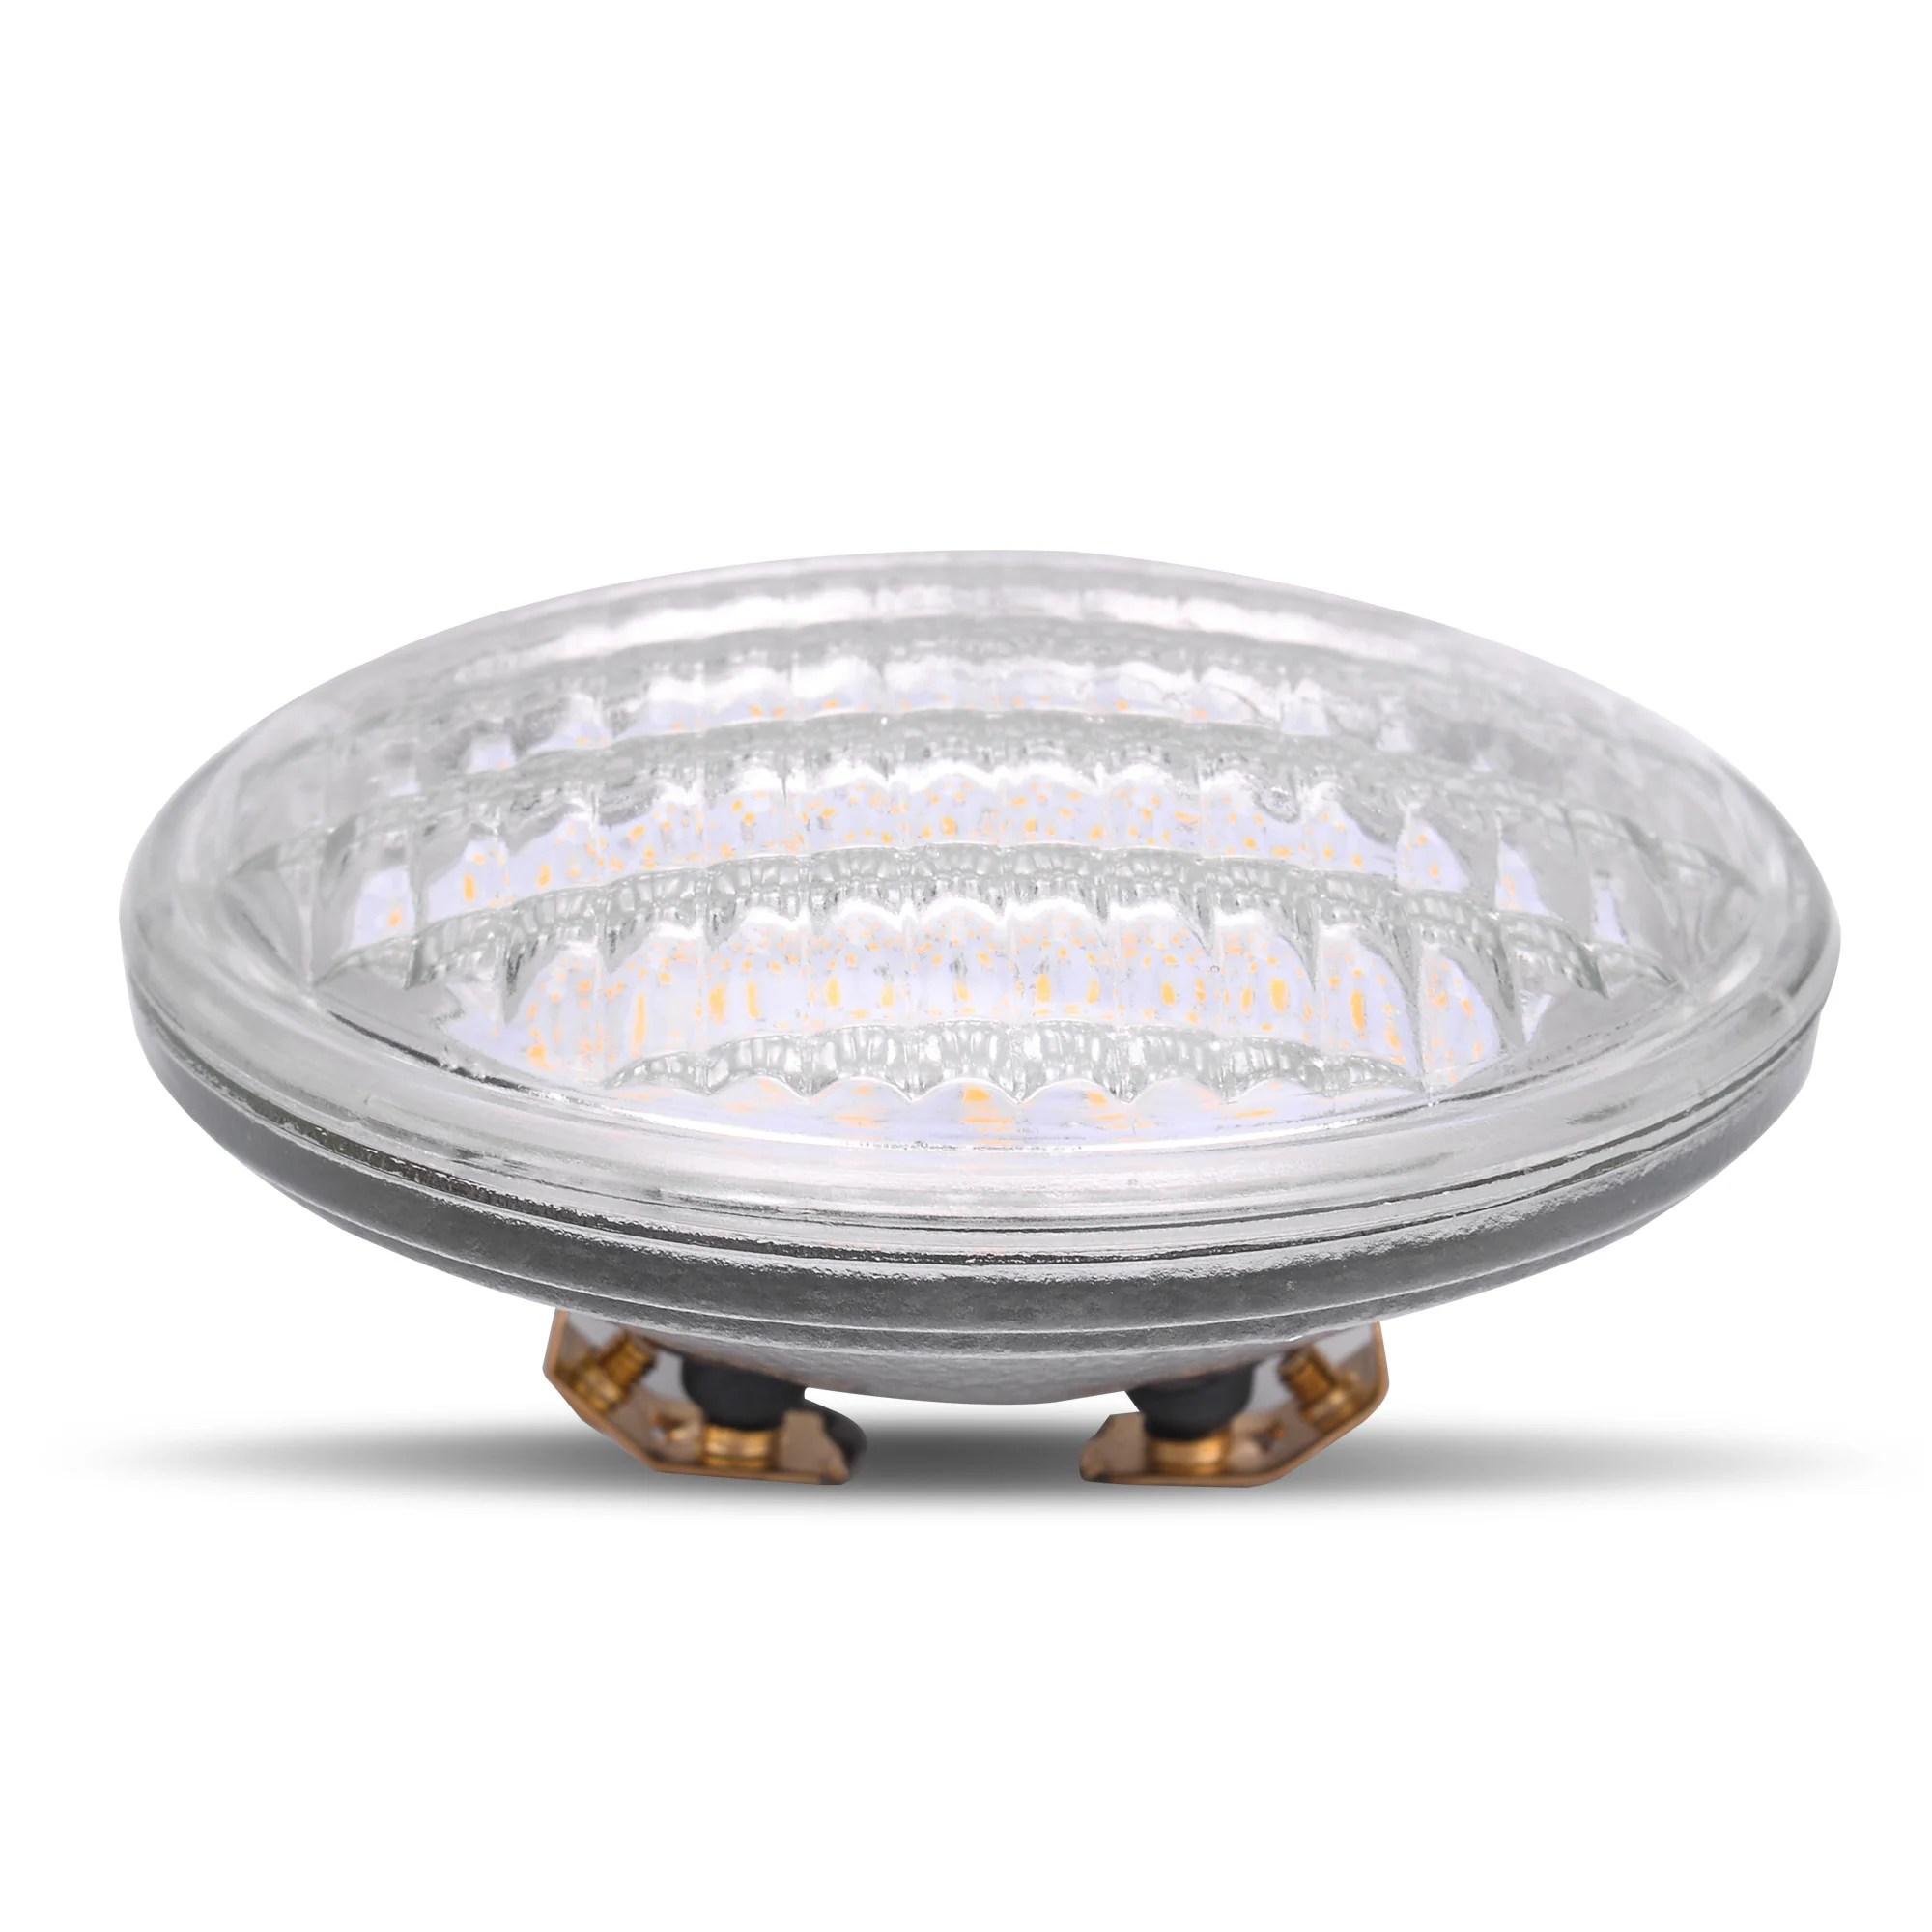 small resolution of par36 ac dc 12 volt ar111 12 watt led replacement light bulb landscape lamp